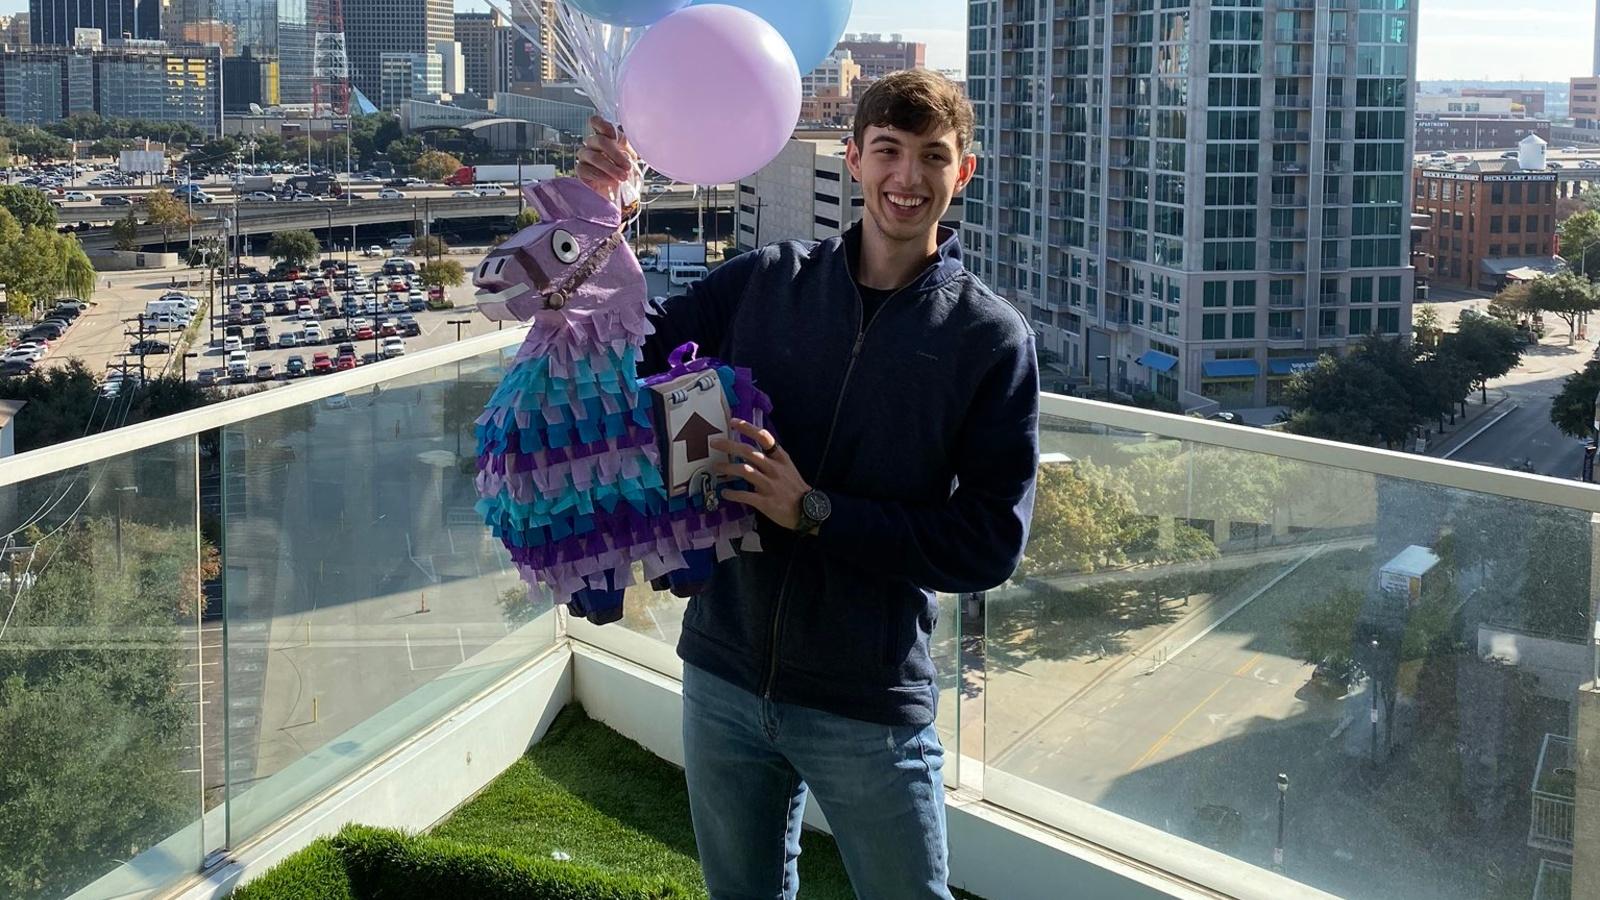 Landon Nickerson Fortnite llama balloons